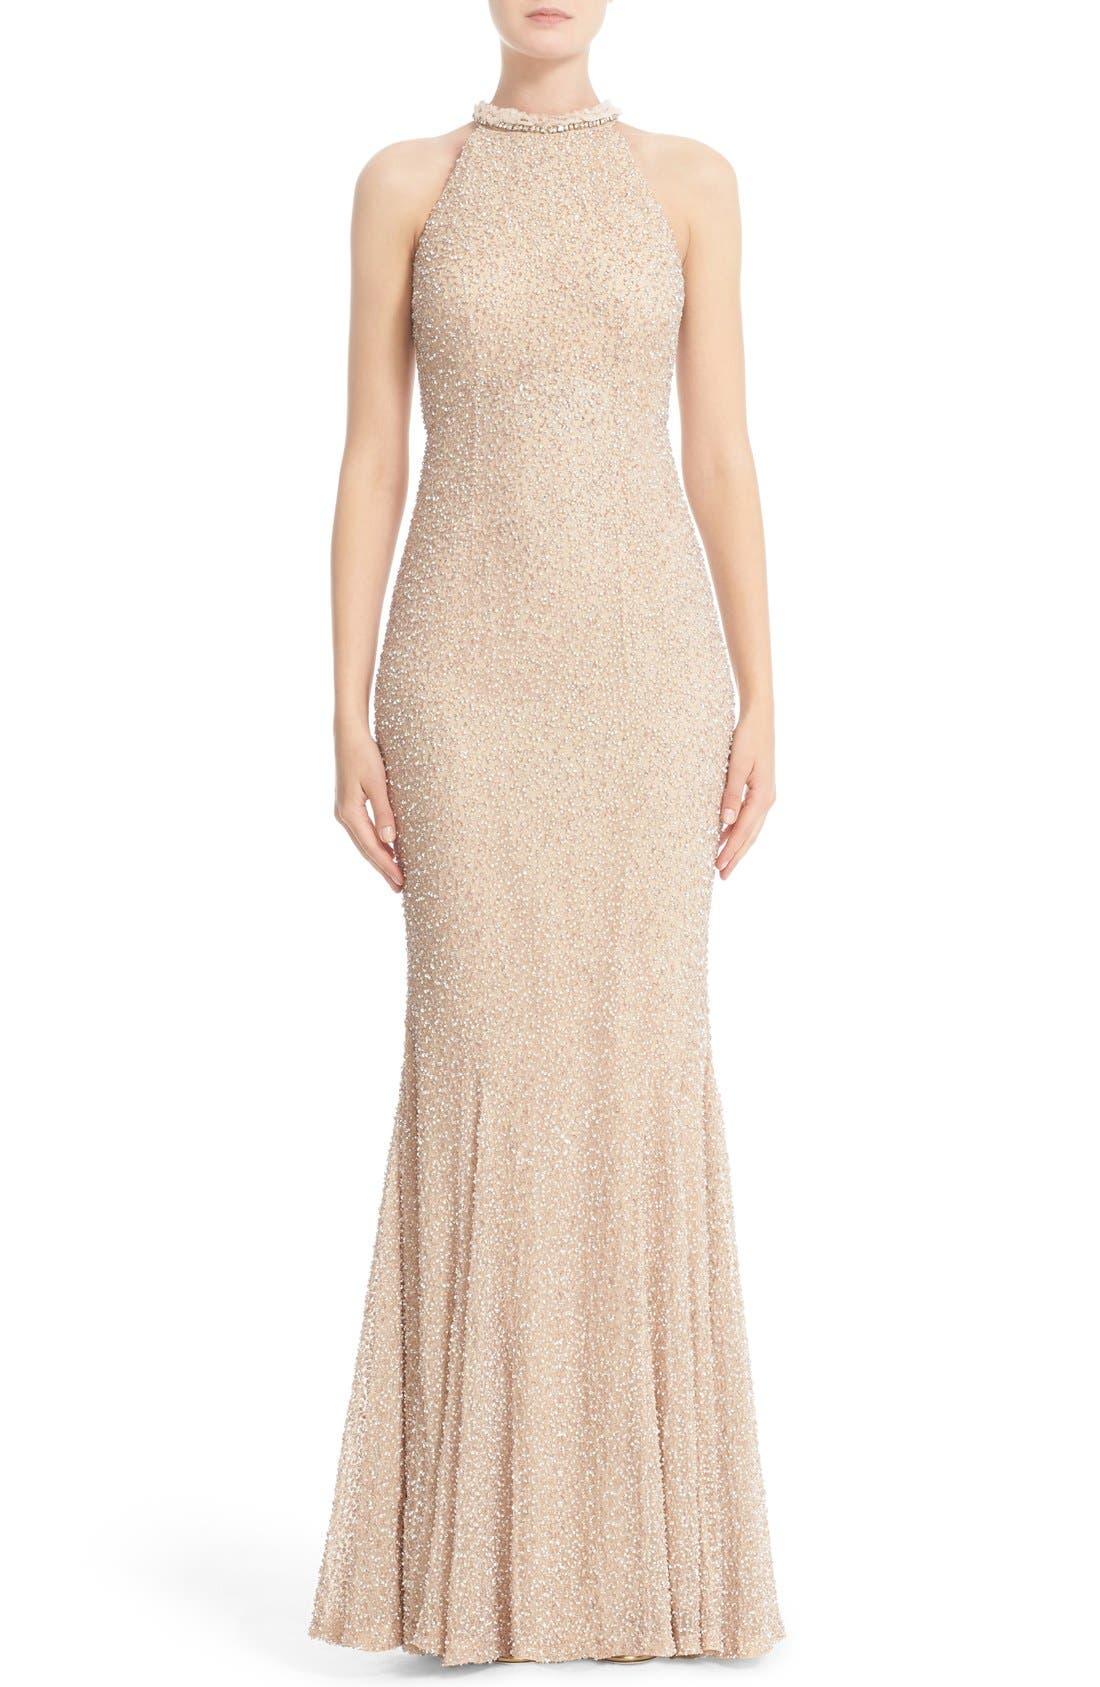 RACHEL GILBERT Hand Embellished Halter Mermaid Gown